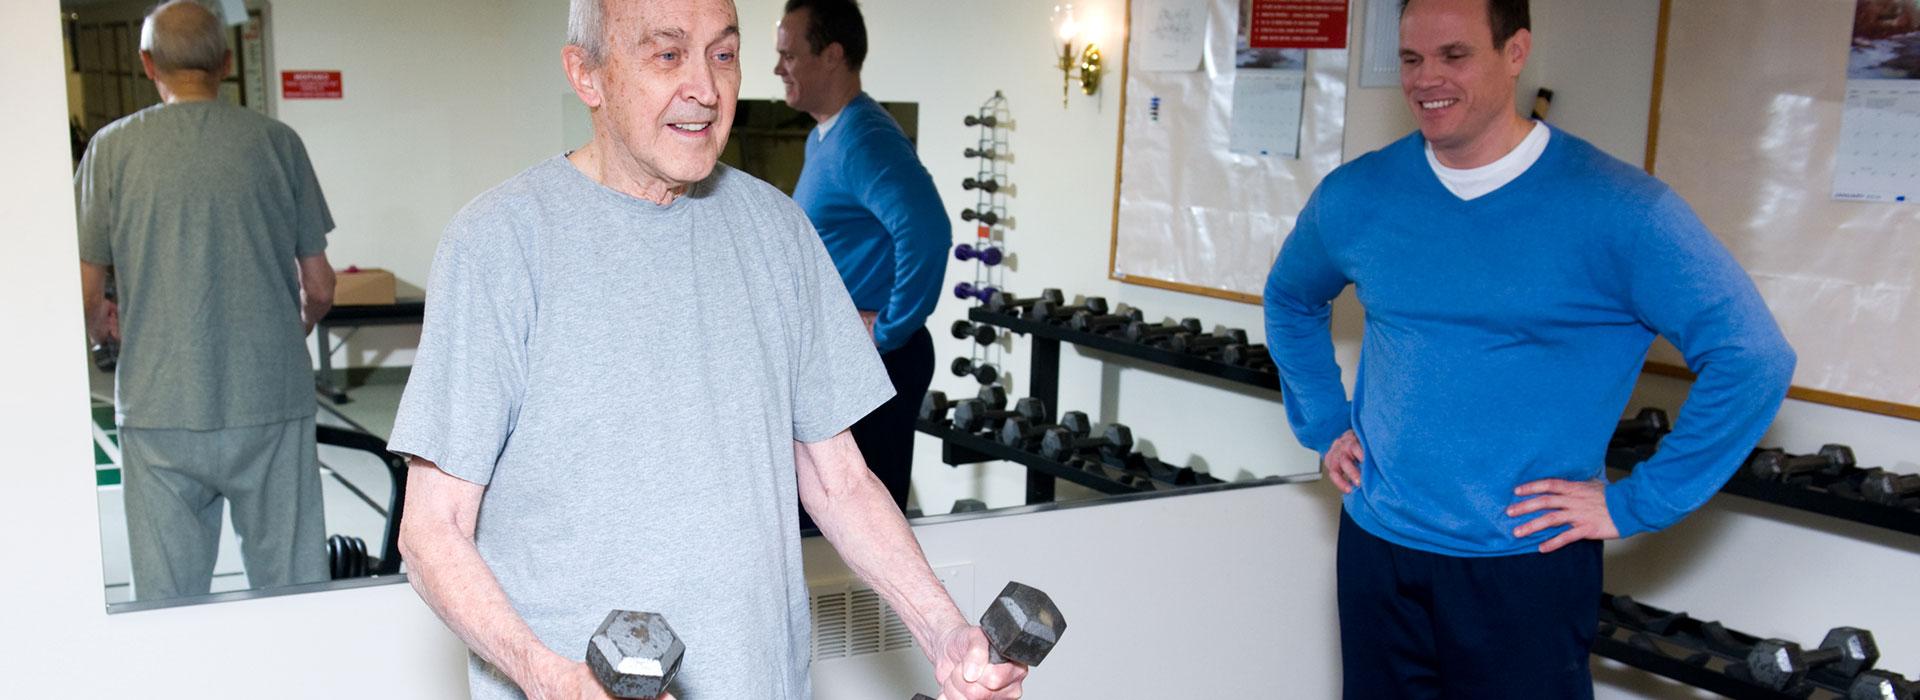 Thirwood Place fitness room